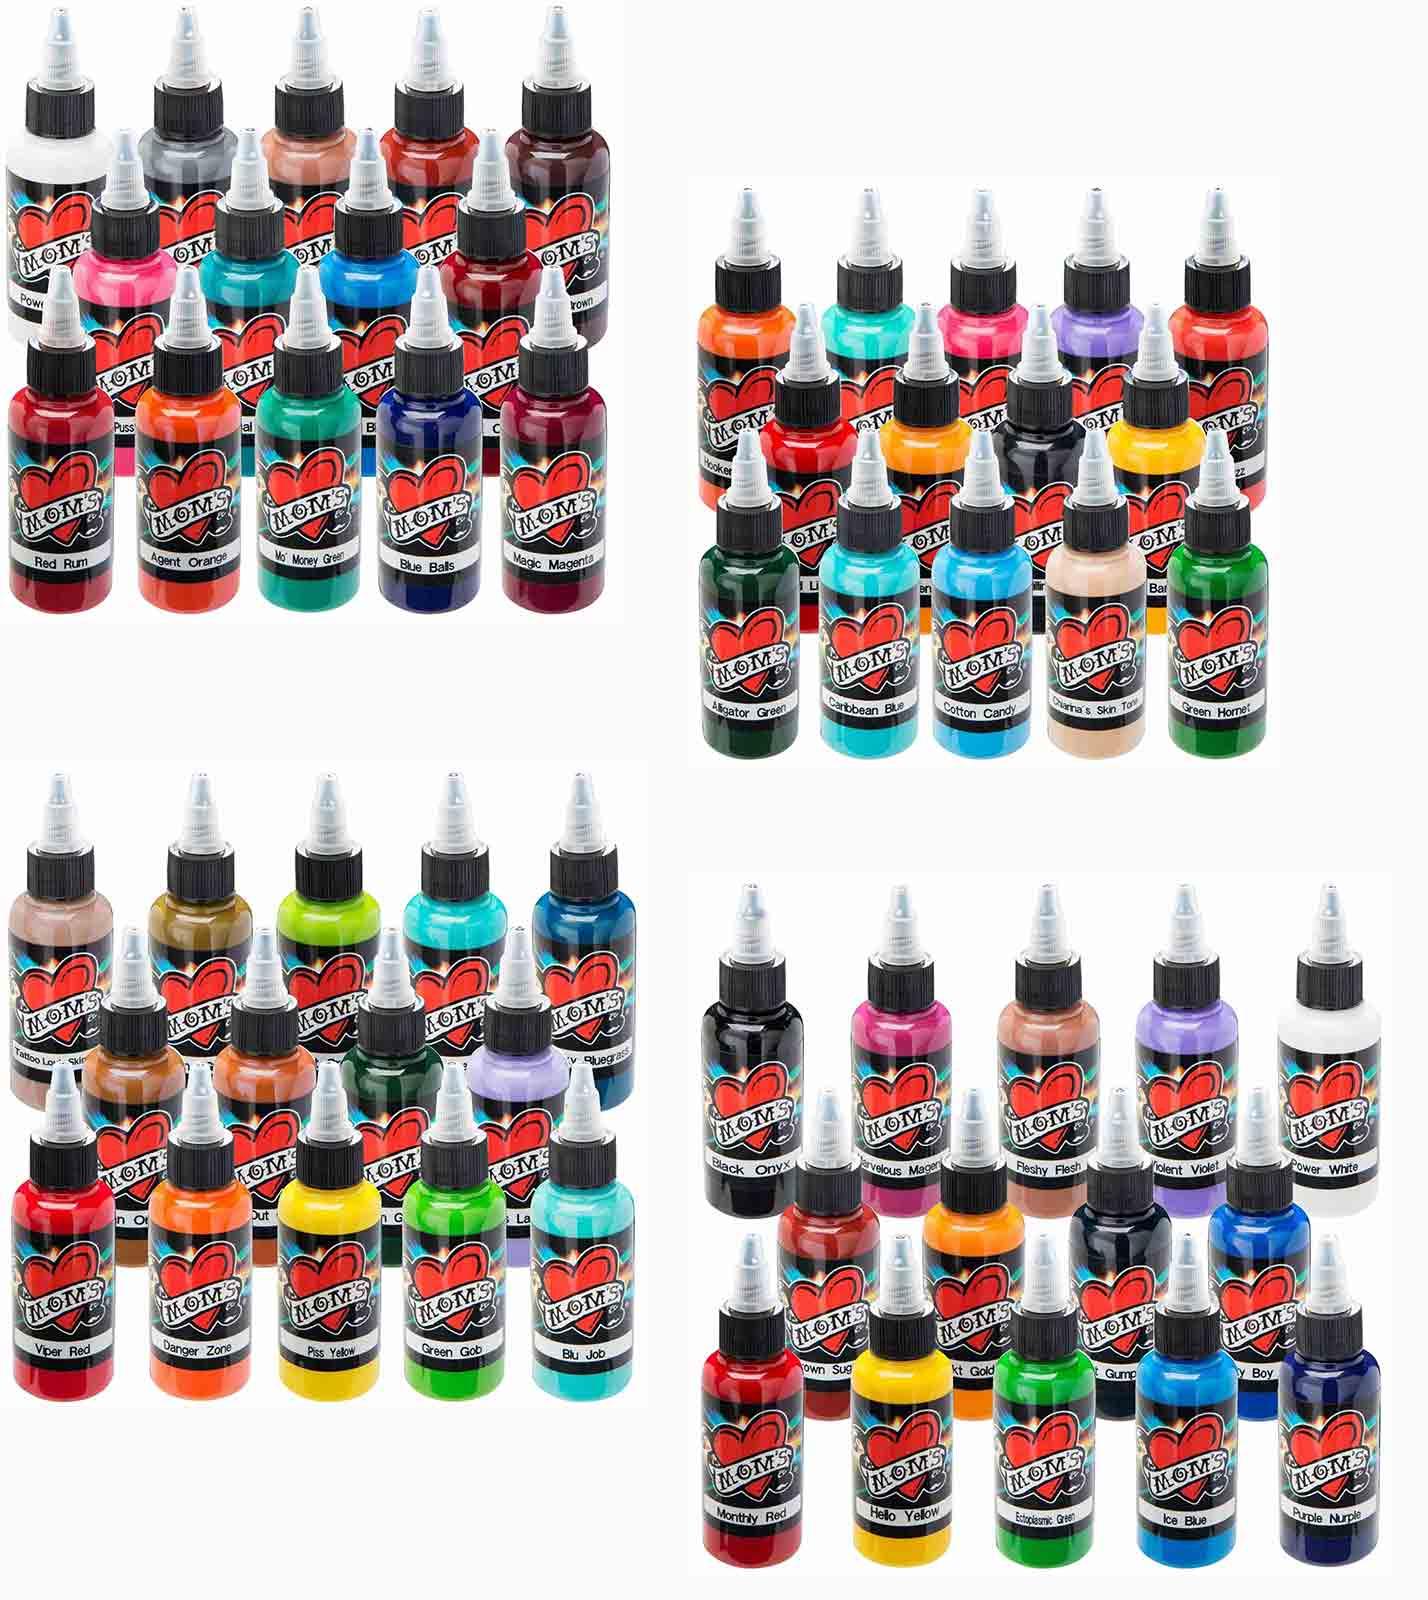 Moms millennium tattoo ink set 56 bottles 1 2 oz for Cheap moms tattoo ink